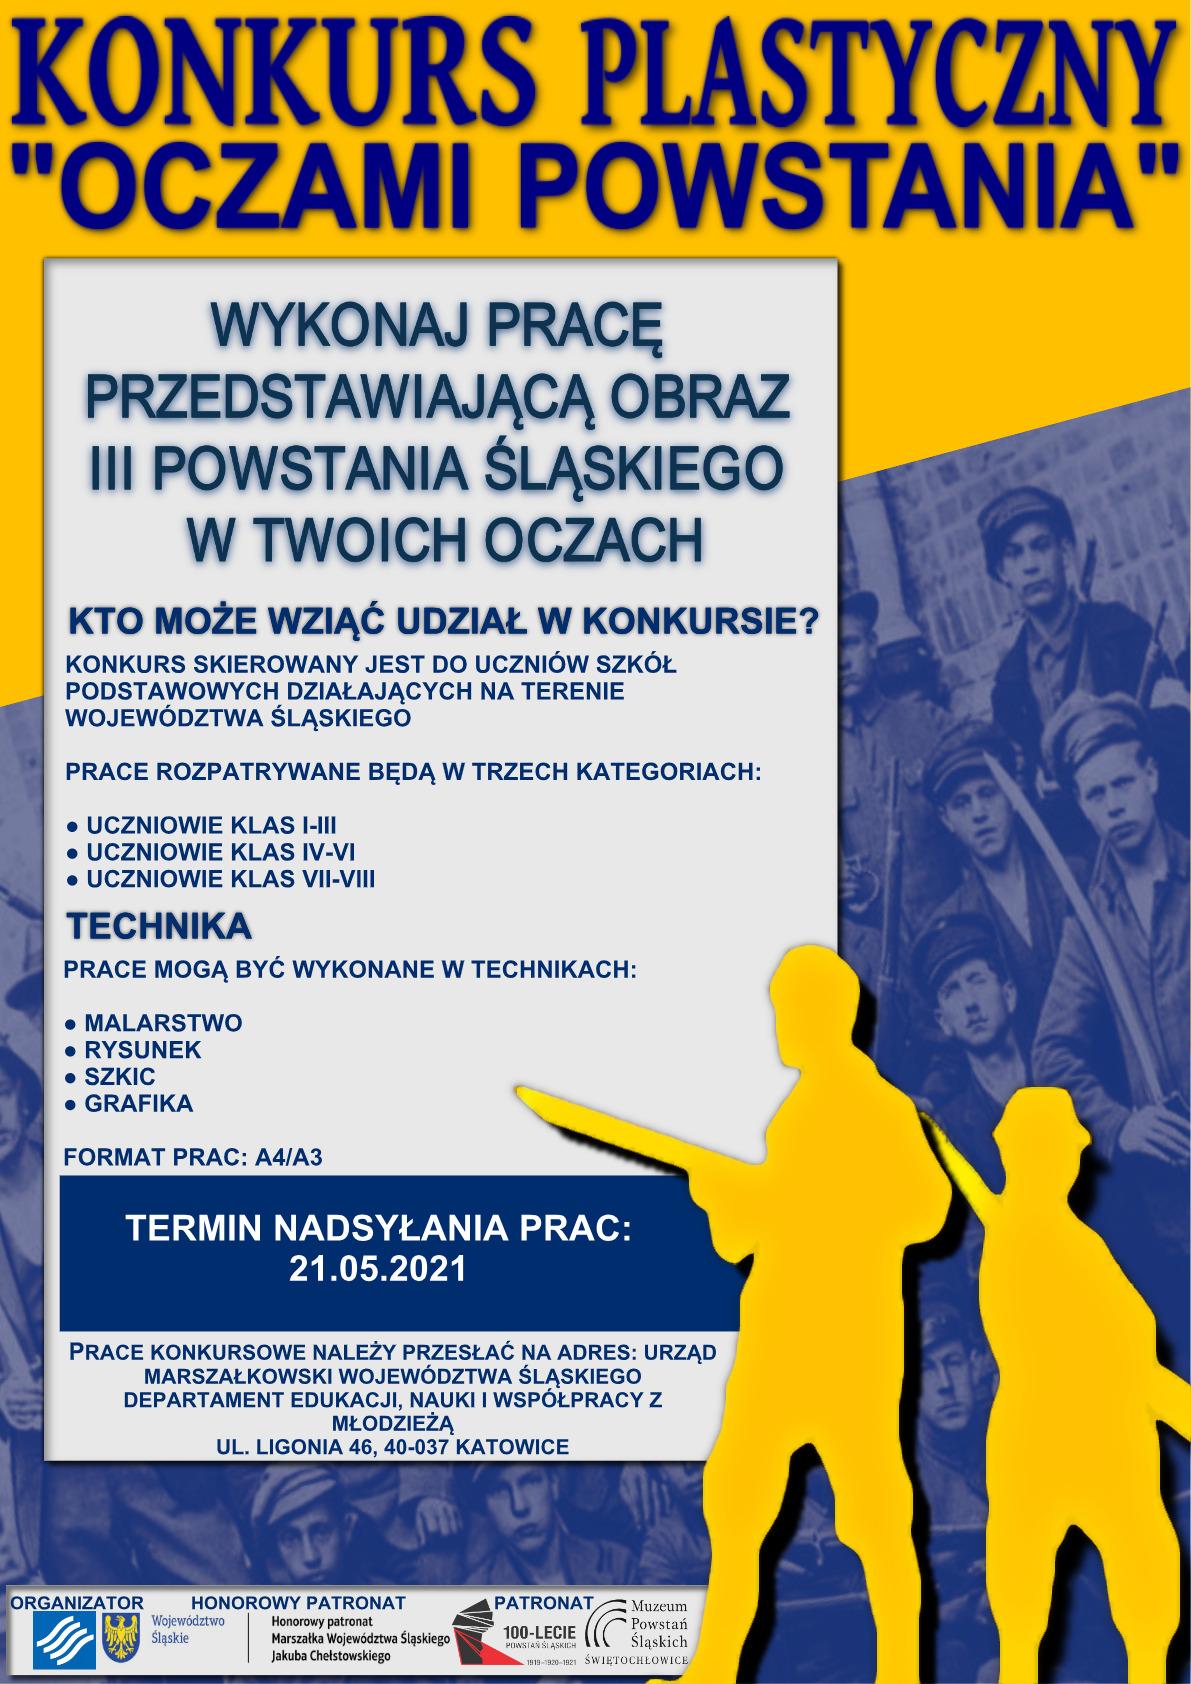 plakat konkursu oczami powstania